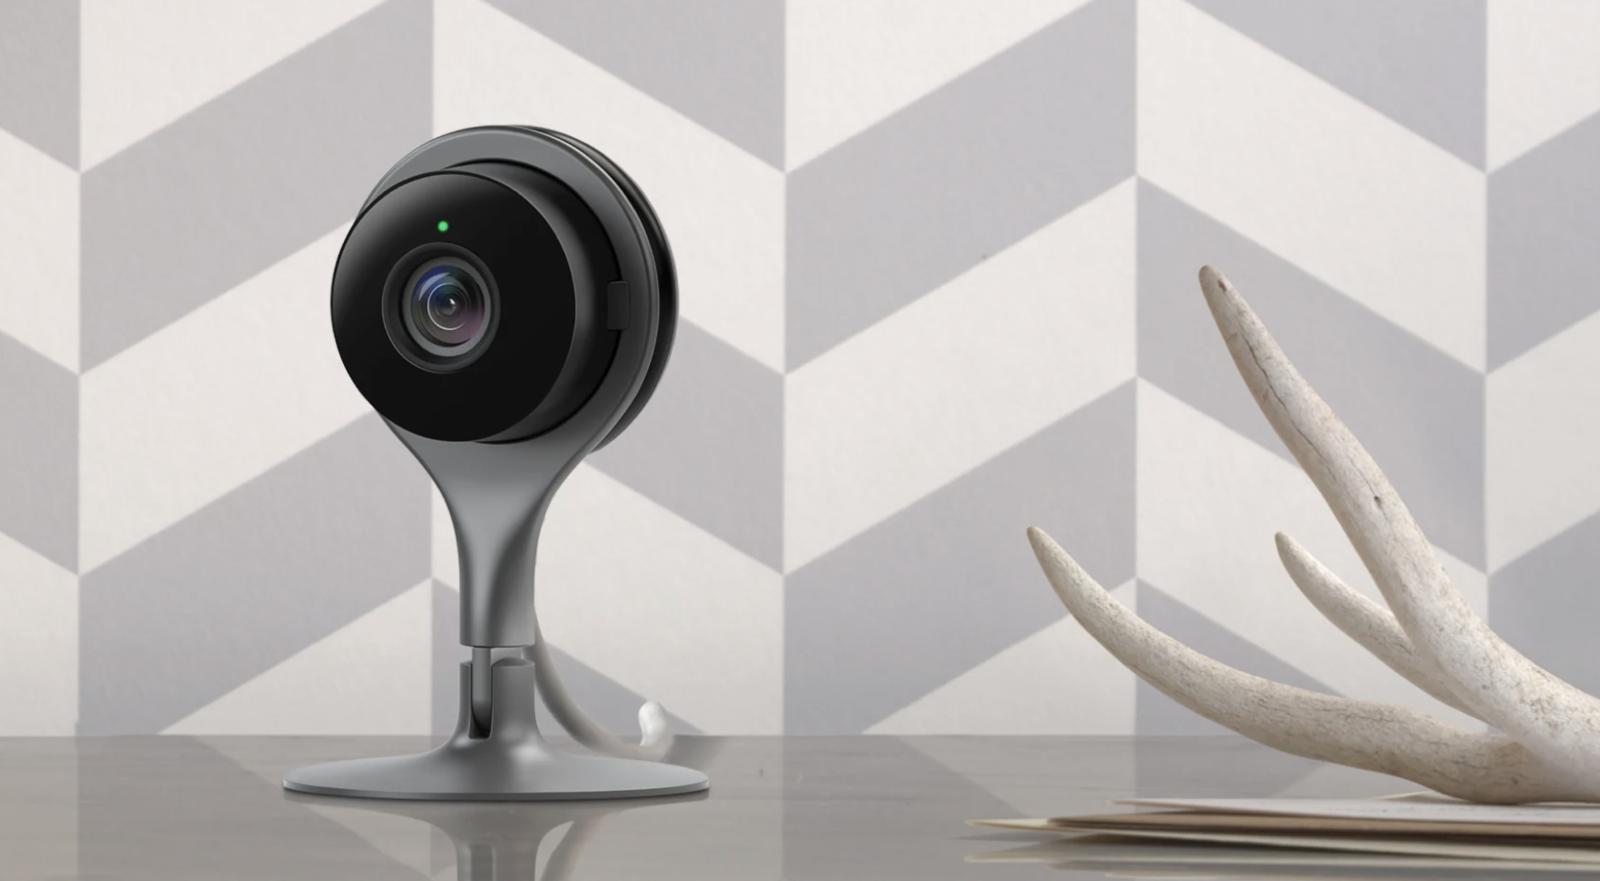 Google Nest Security Camera